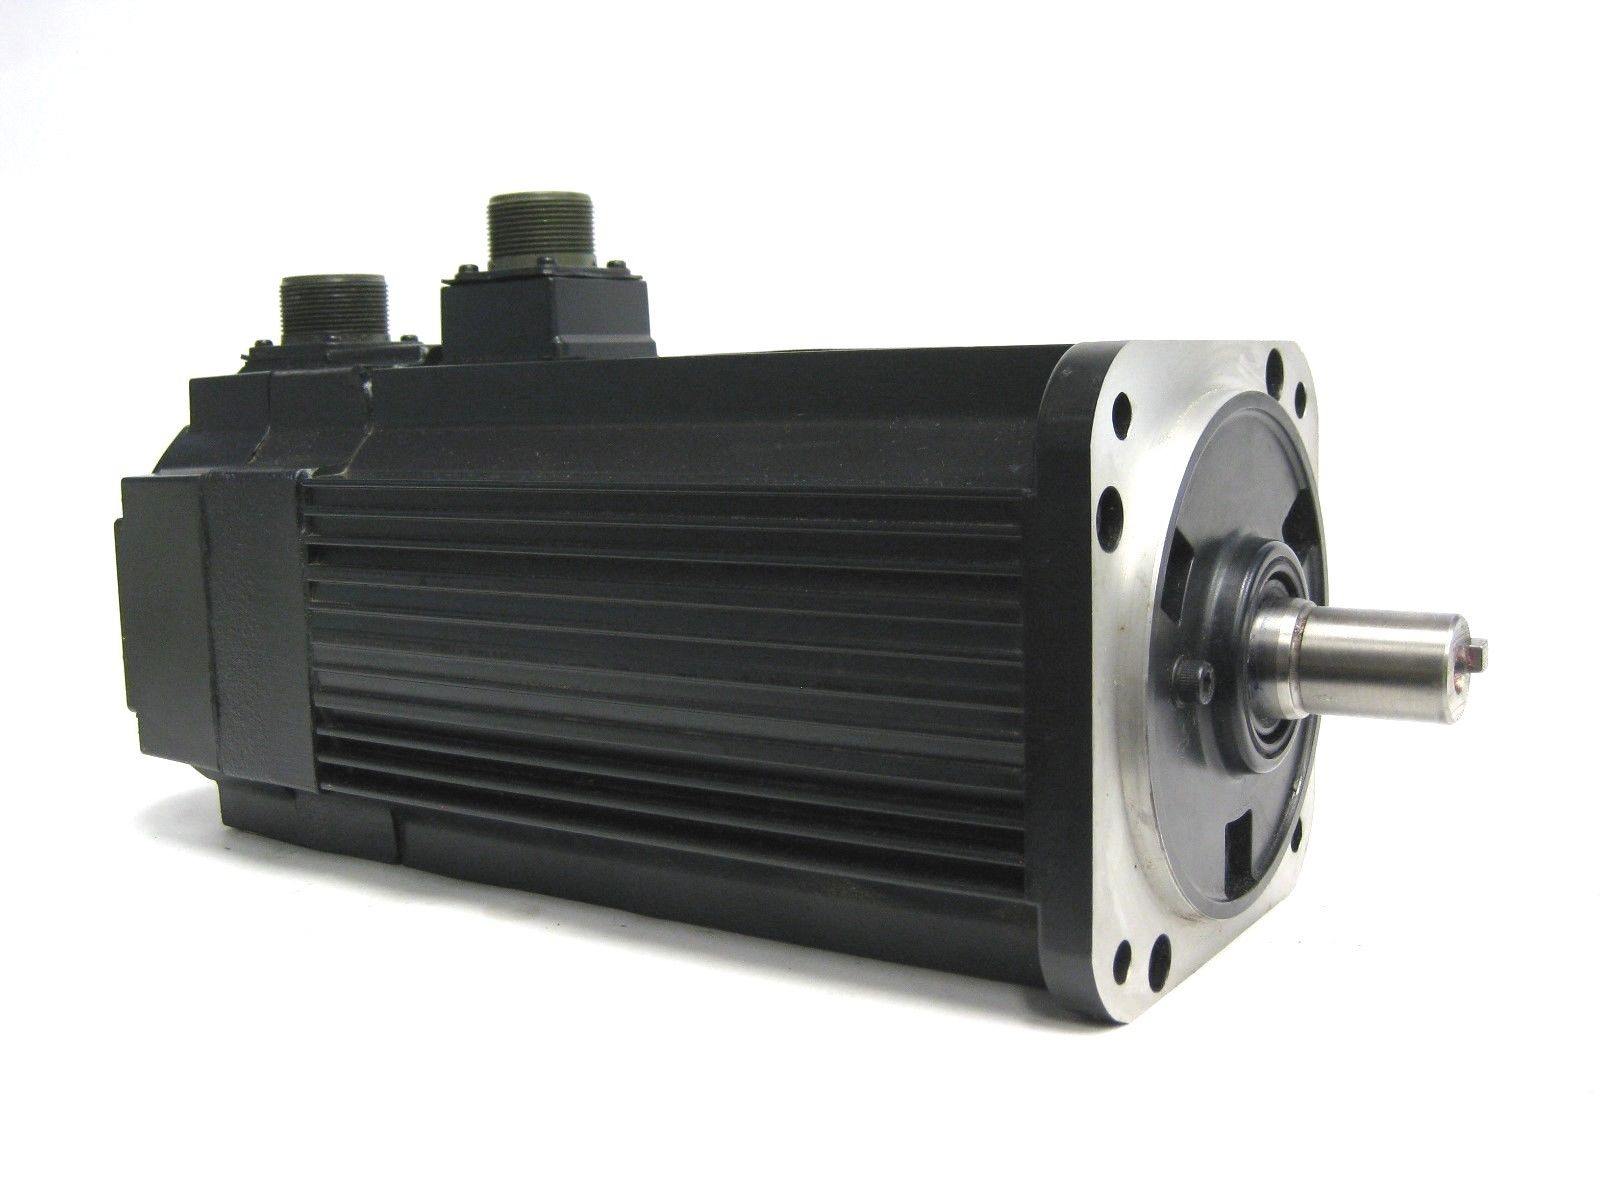 Yaskawa USAFED-12-HL11 AC Servo Motor